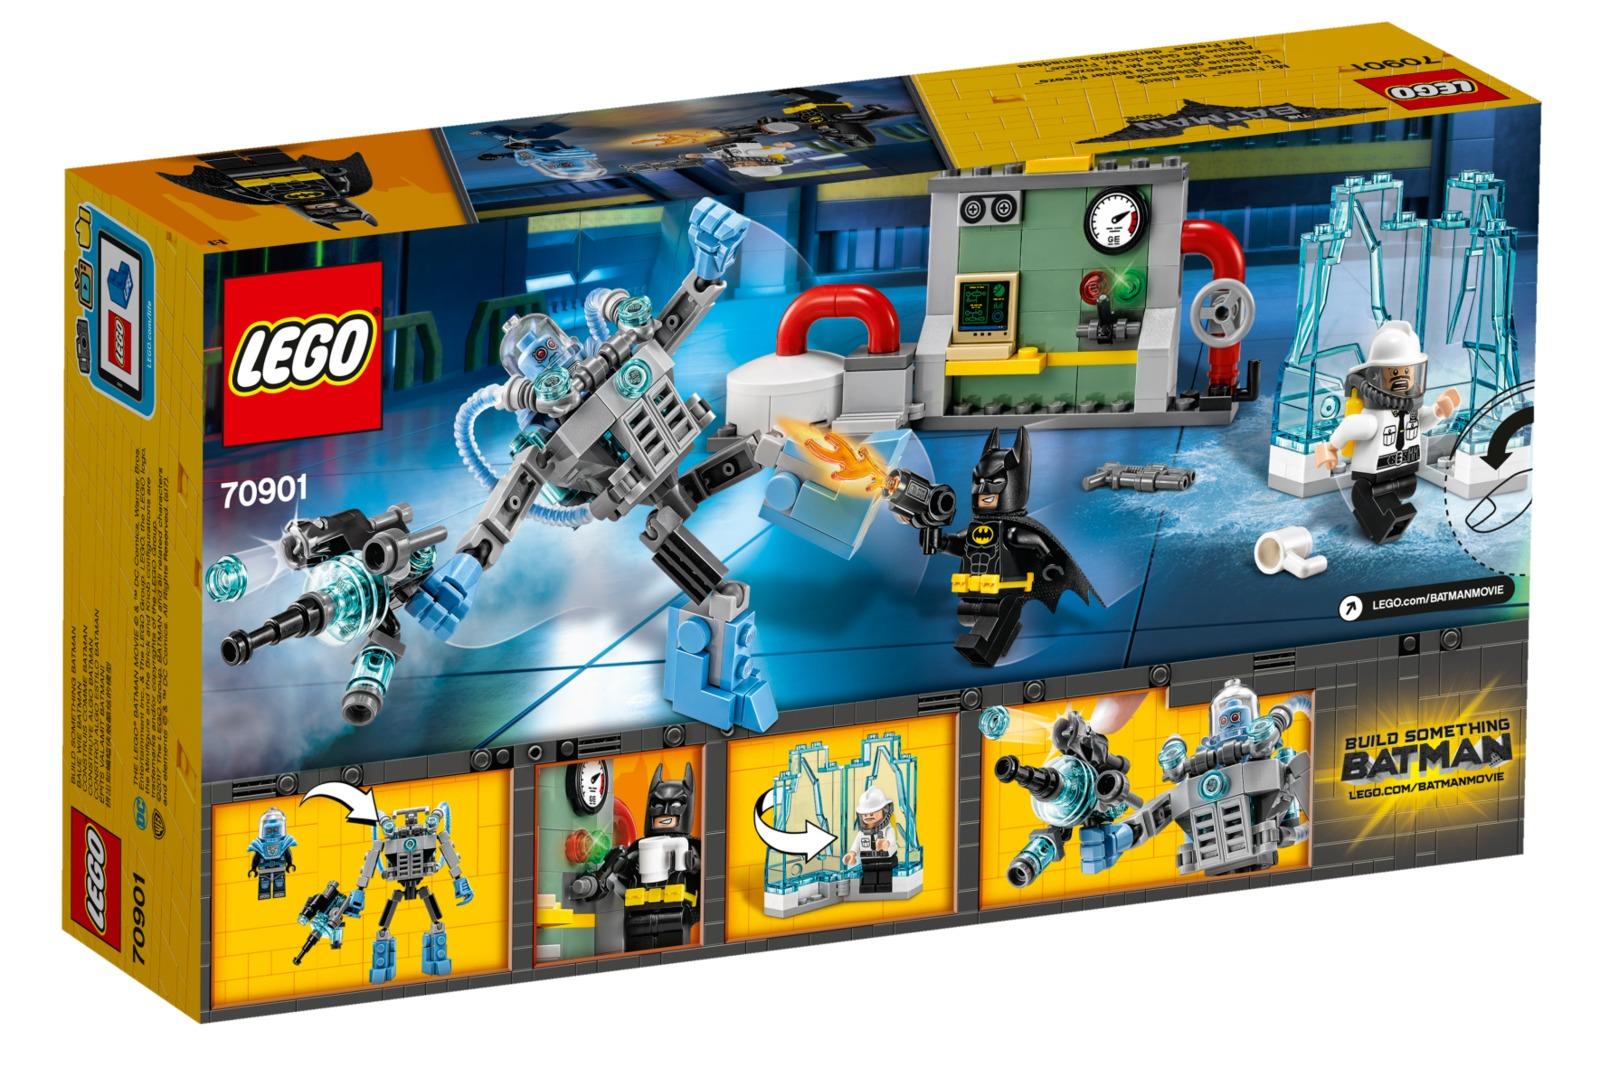 LEGO Batman Movie - Mr. Freeze Ice Attack (70901) | Toy